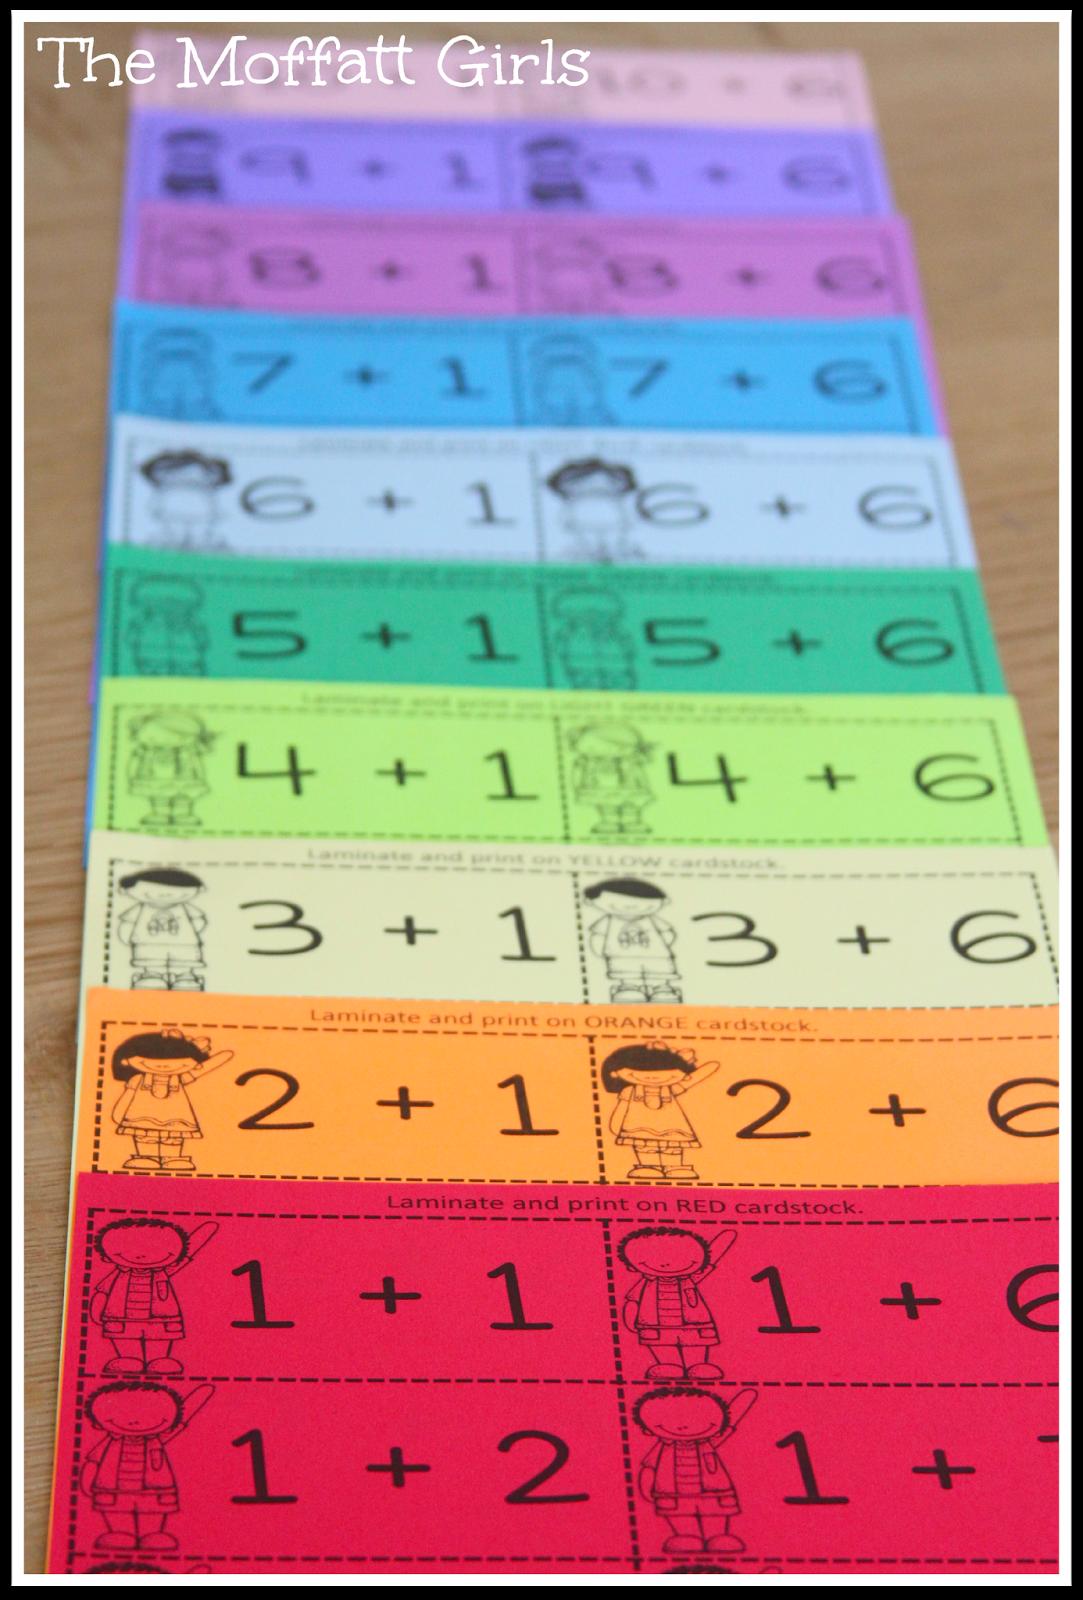 The Moffatt Girls: Interactive Math Makes Learning FUN! | Classroom ...